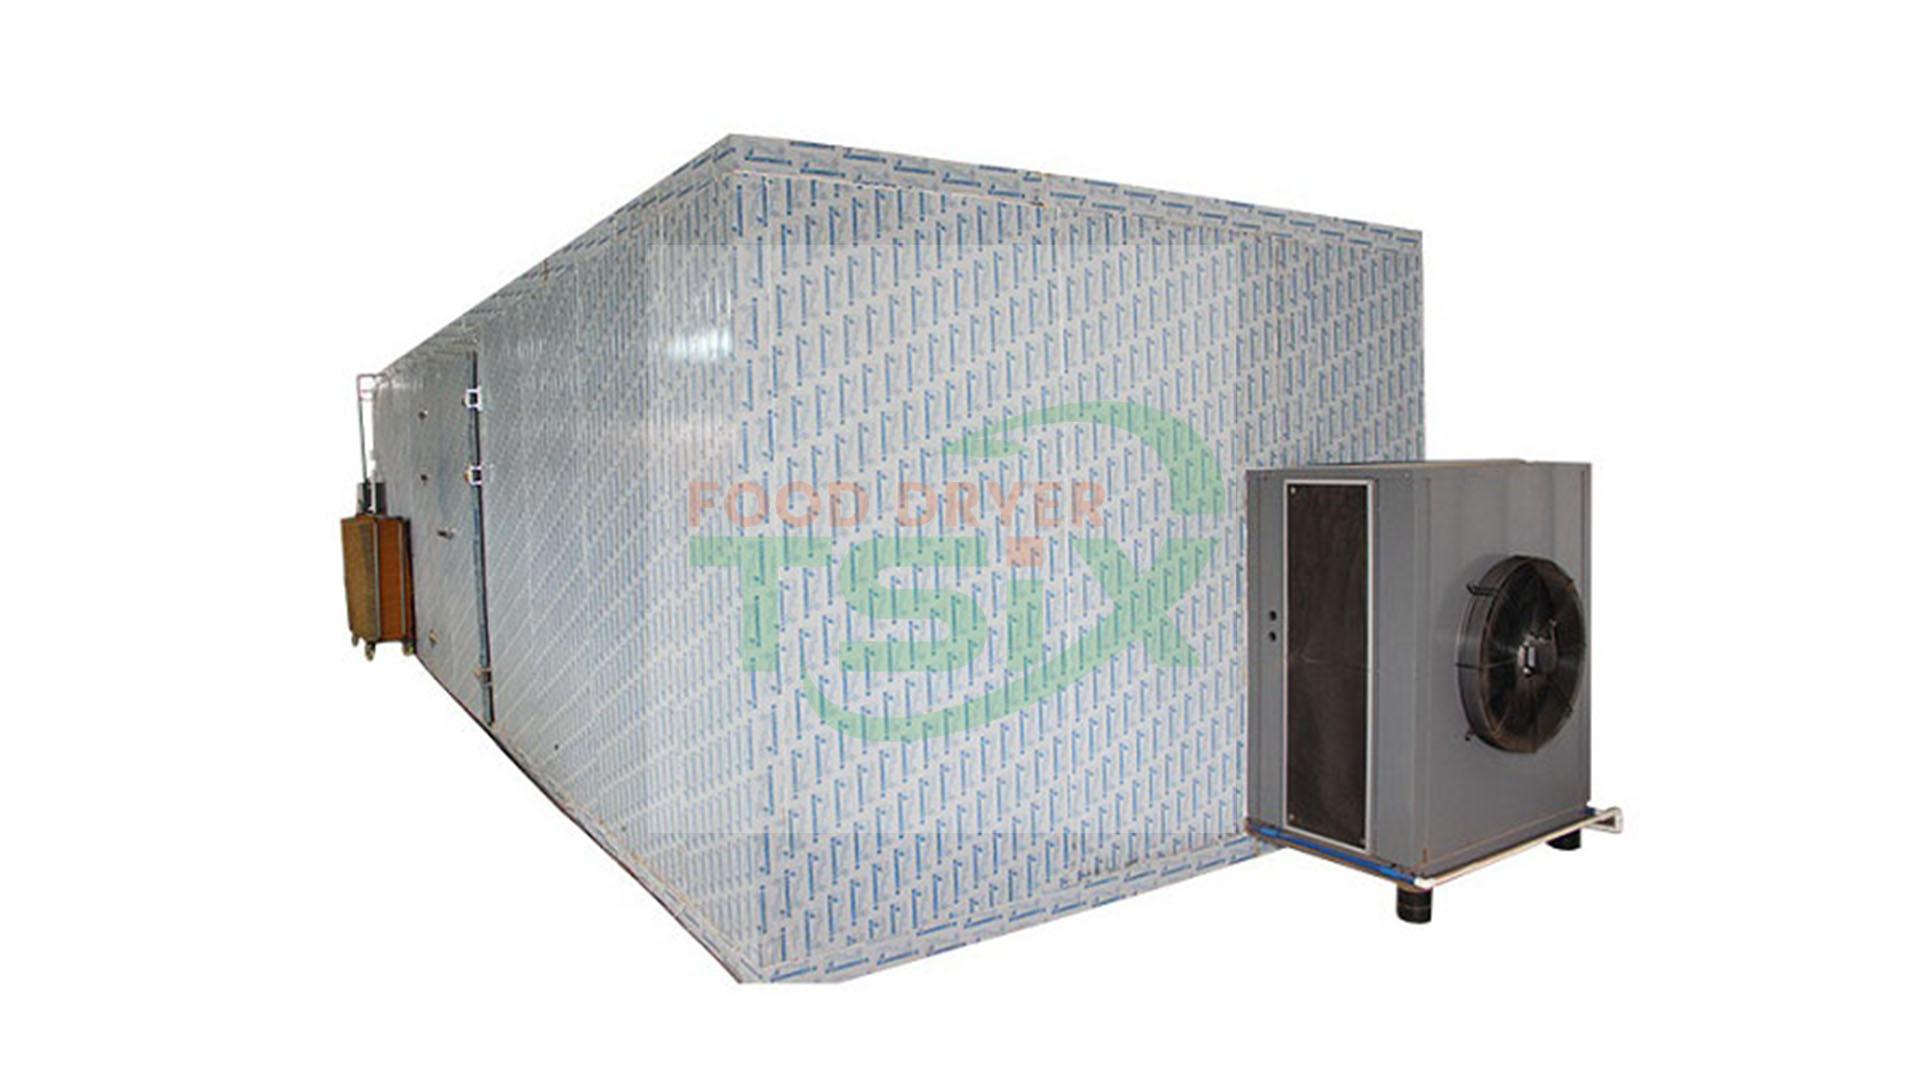 500 Tropical Fruit Dedydrator to Dry Mango Pineapple Jackfruit Banana and Avocado DPHG080S-G